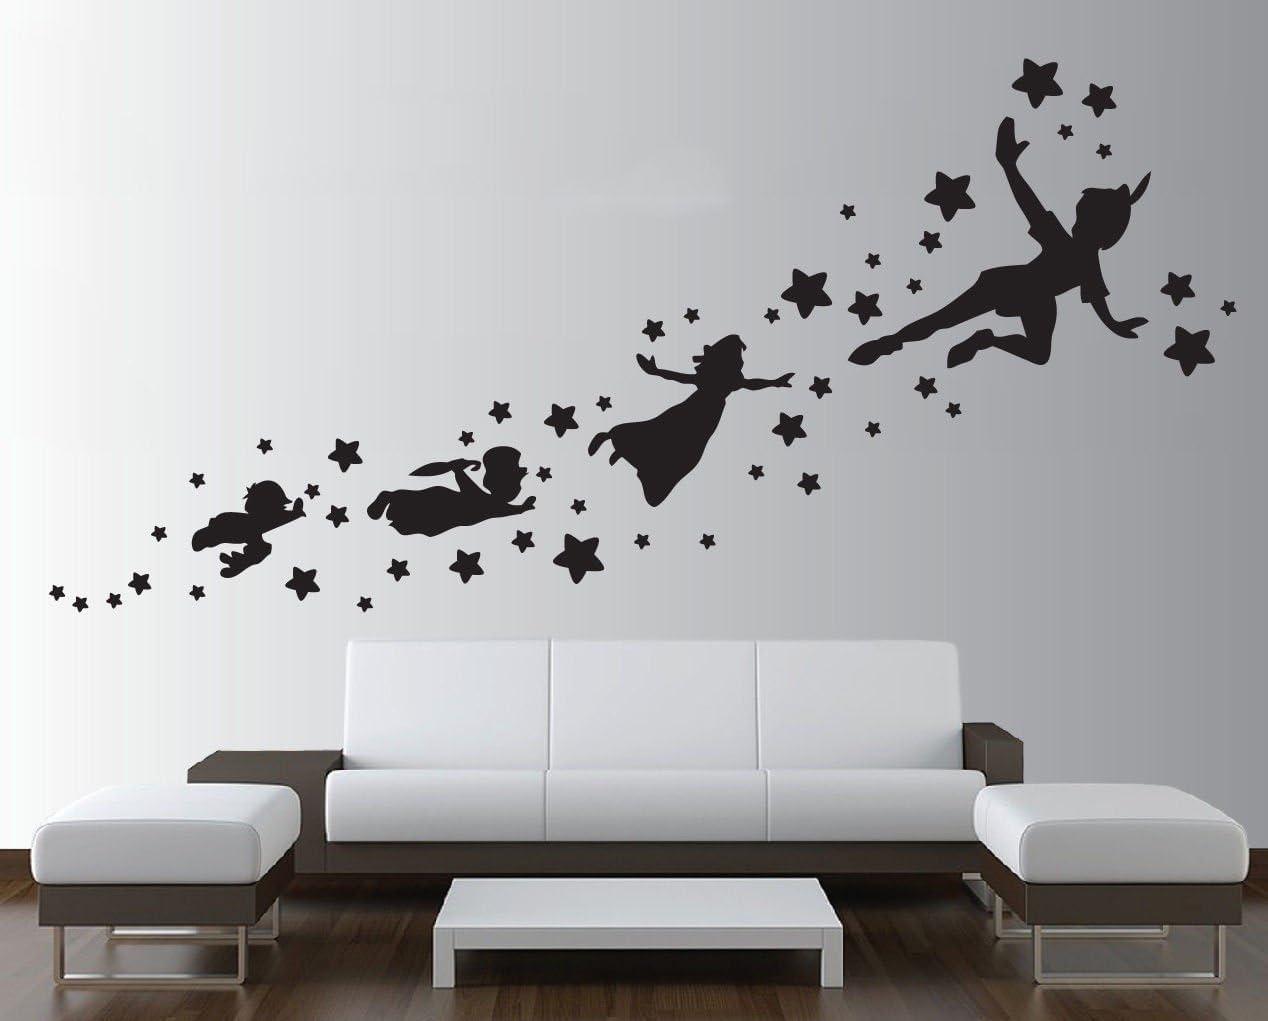 Etiqueta de la pared extraíble de la sombra de Peter pan de ...